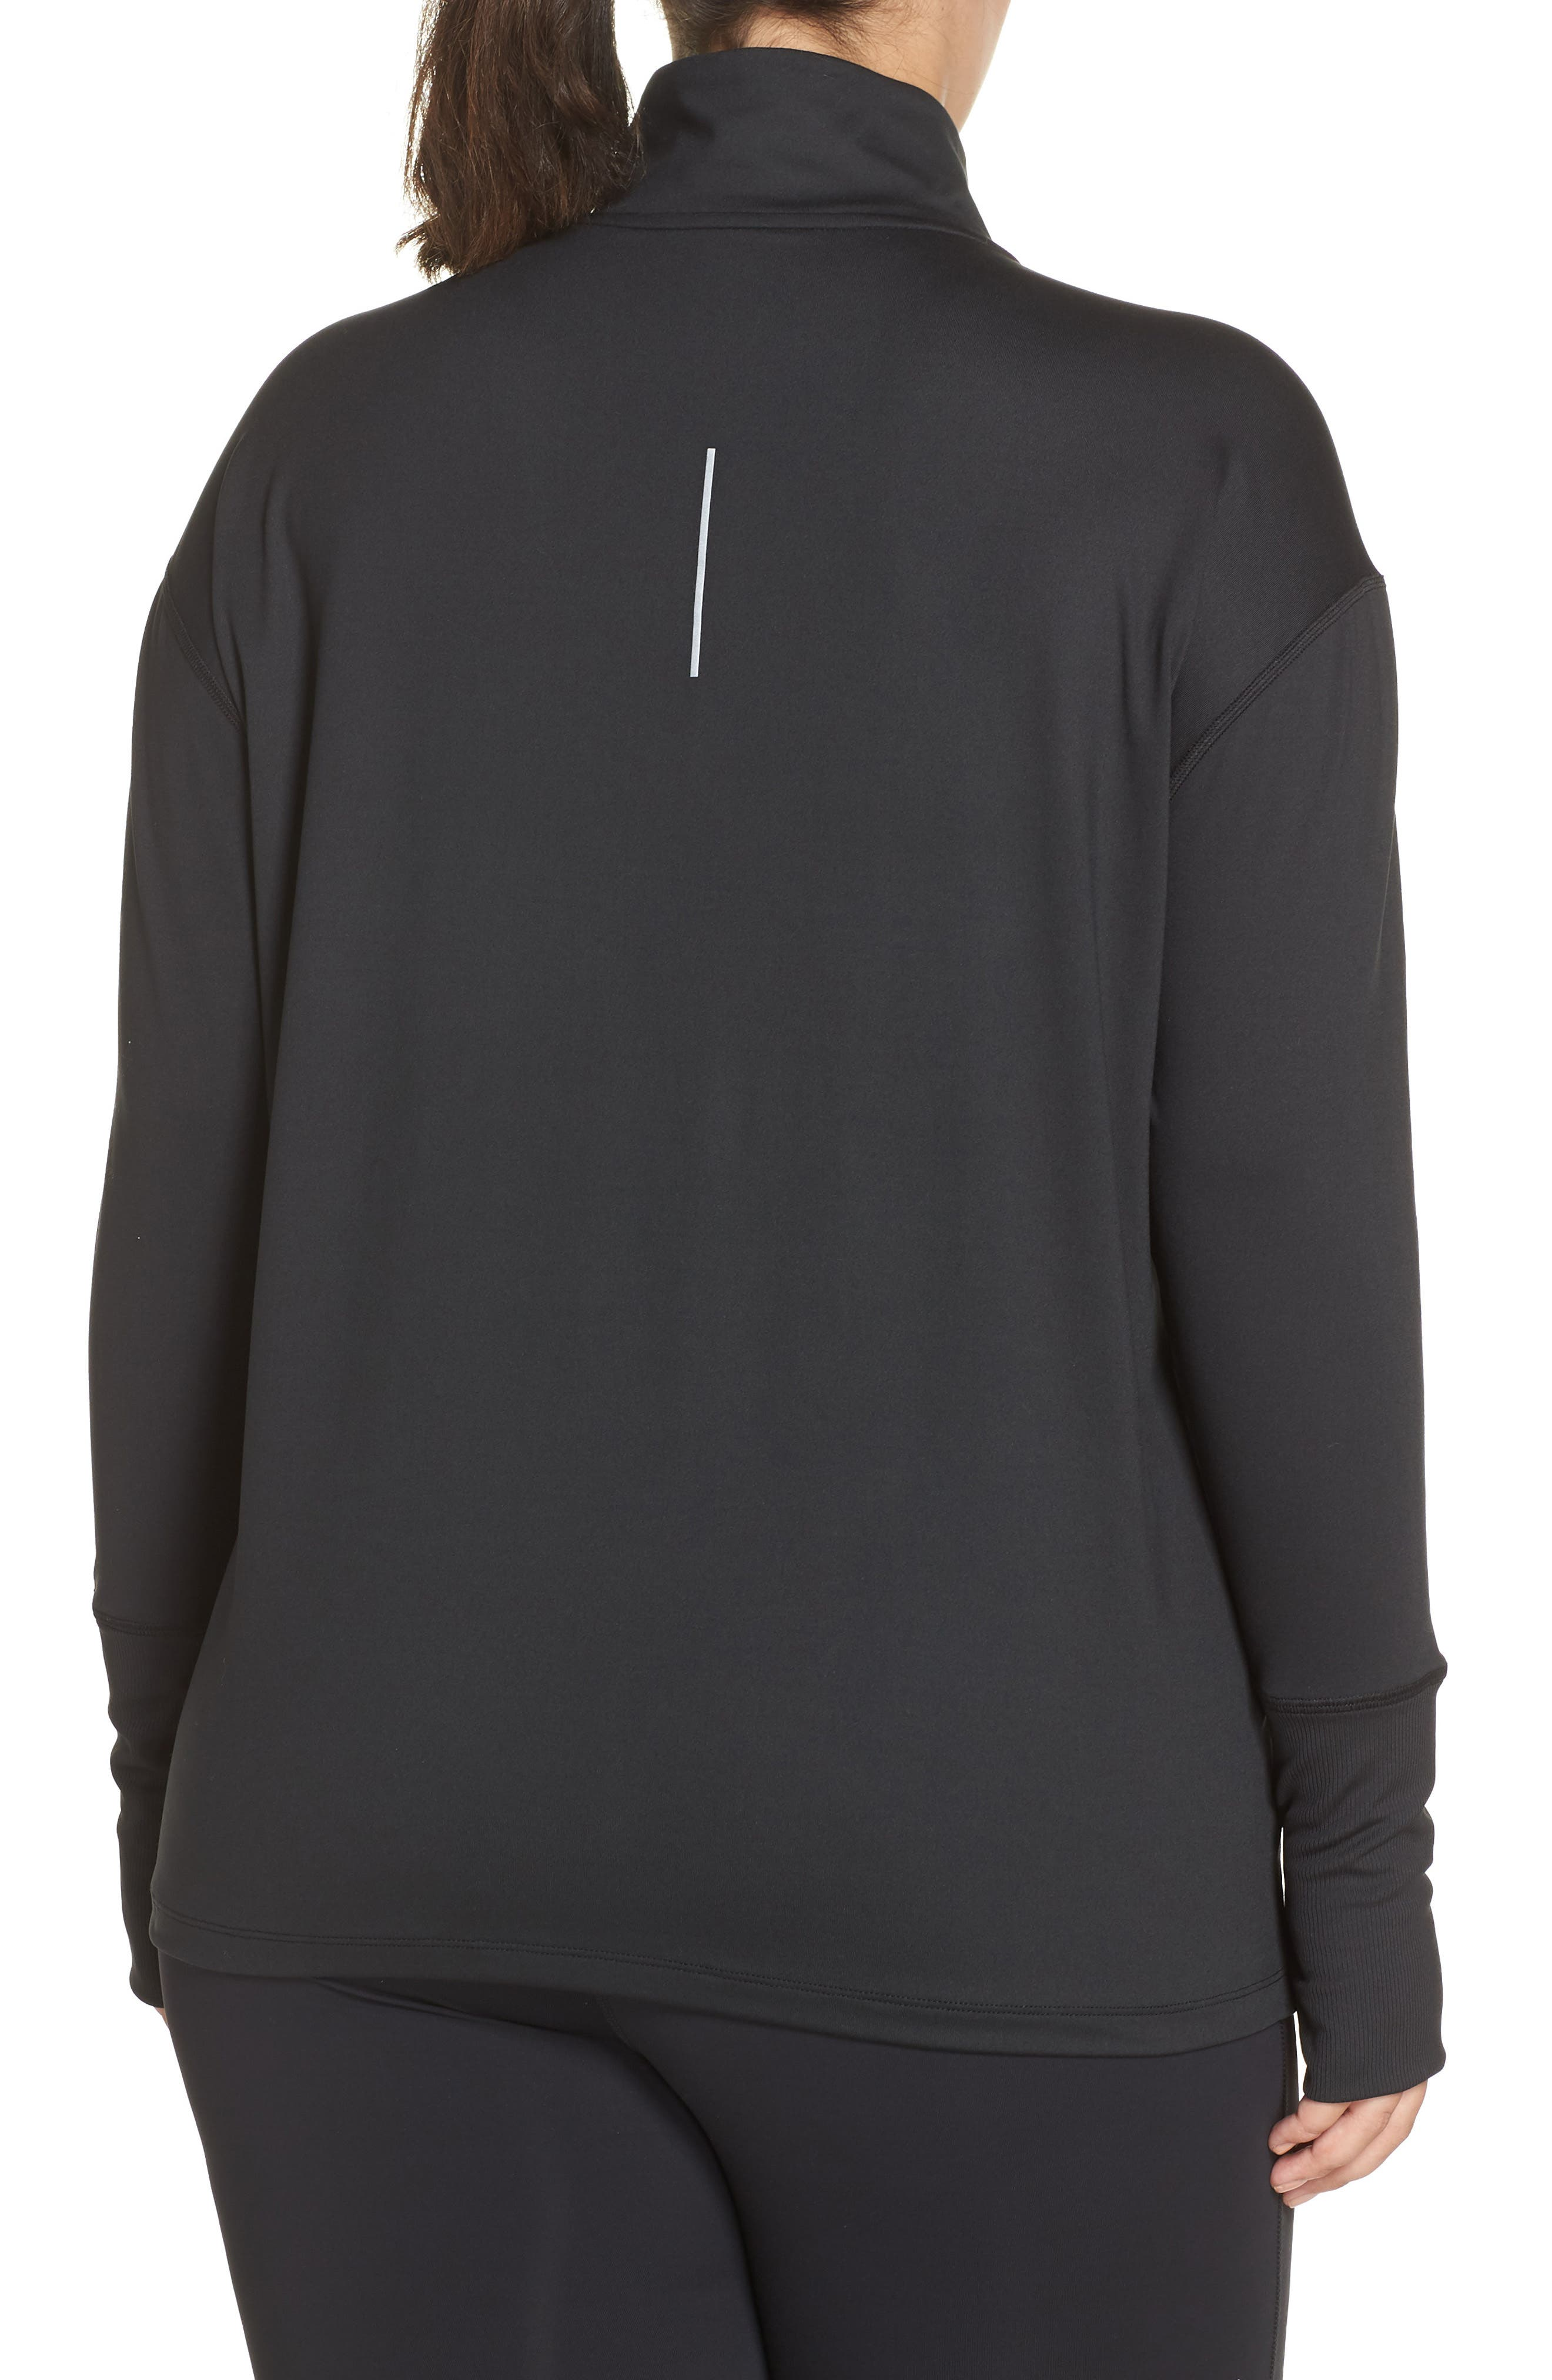 8d864930c4a4 Nike Sweatshirts   Hoodies for Women